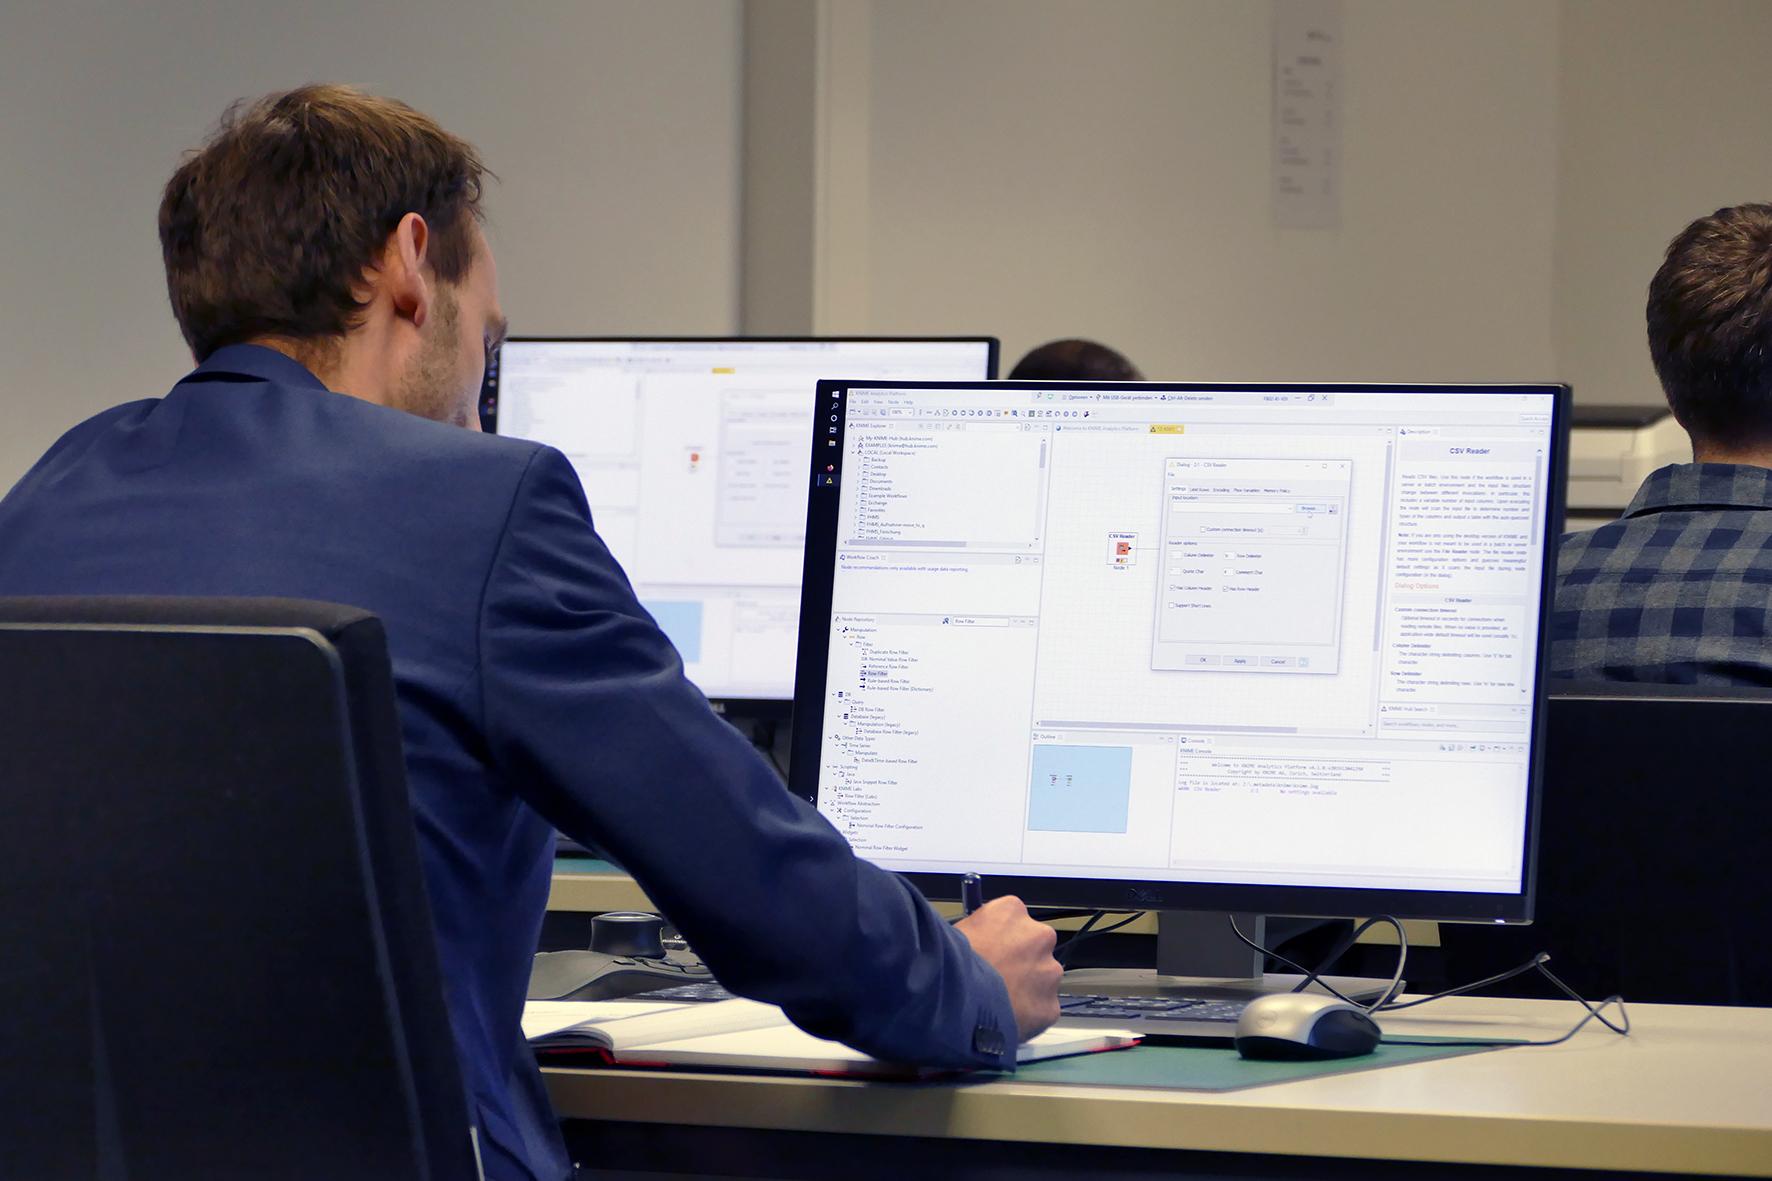 Teilnehmer am Computer